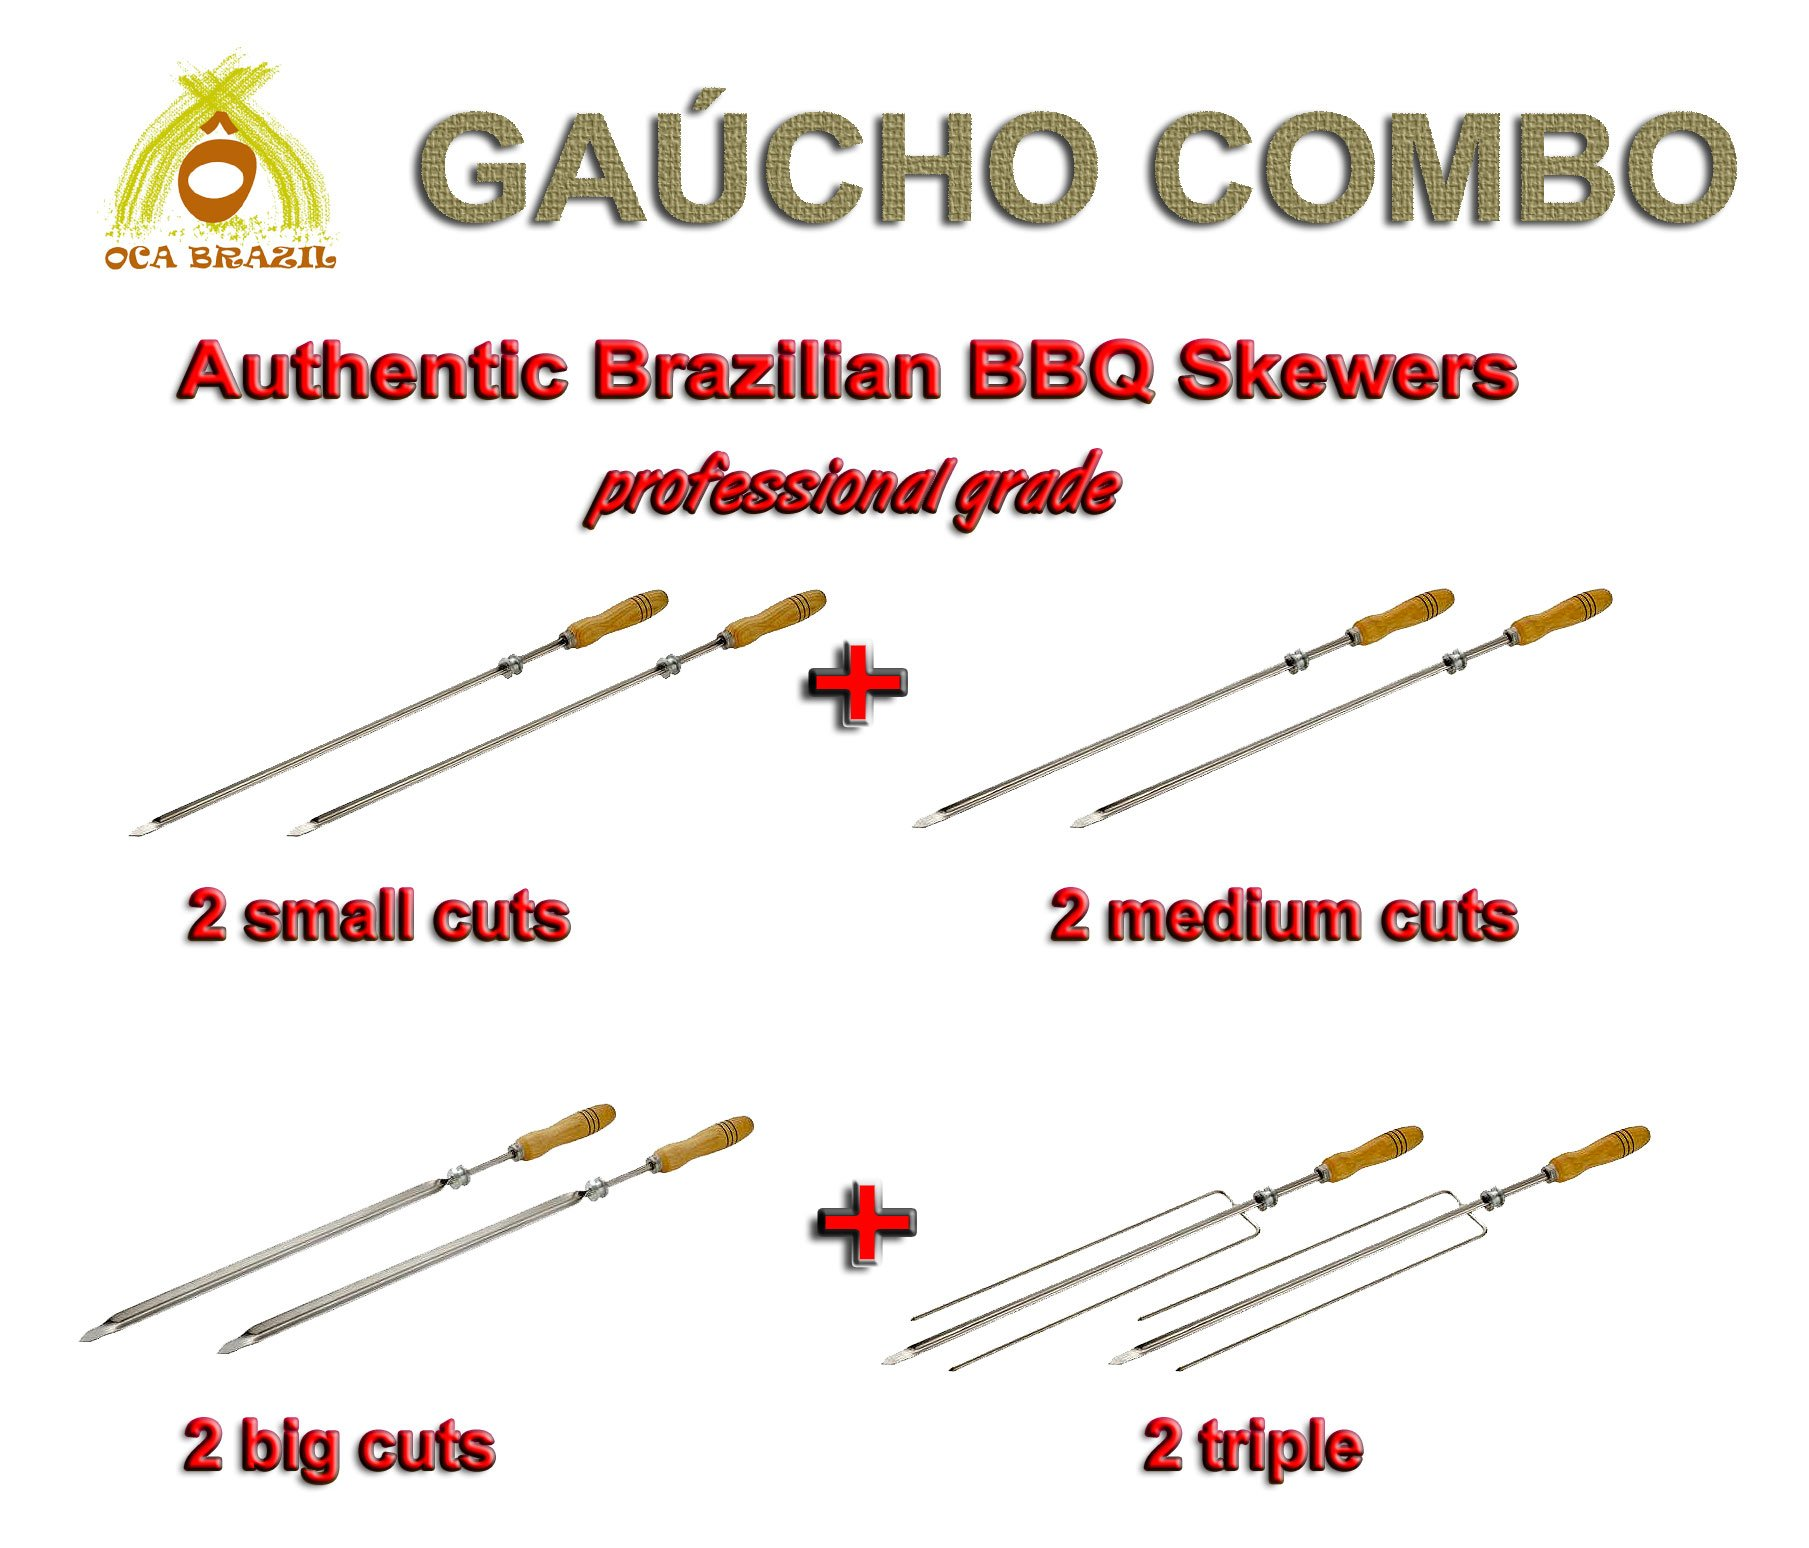 Oca-Brazil Brazilian Skewers for BBQ 28'' - Professional Grade - Set of 8 - Gaucho Combo by Oca-Brazil